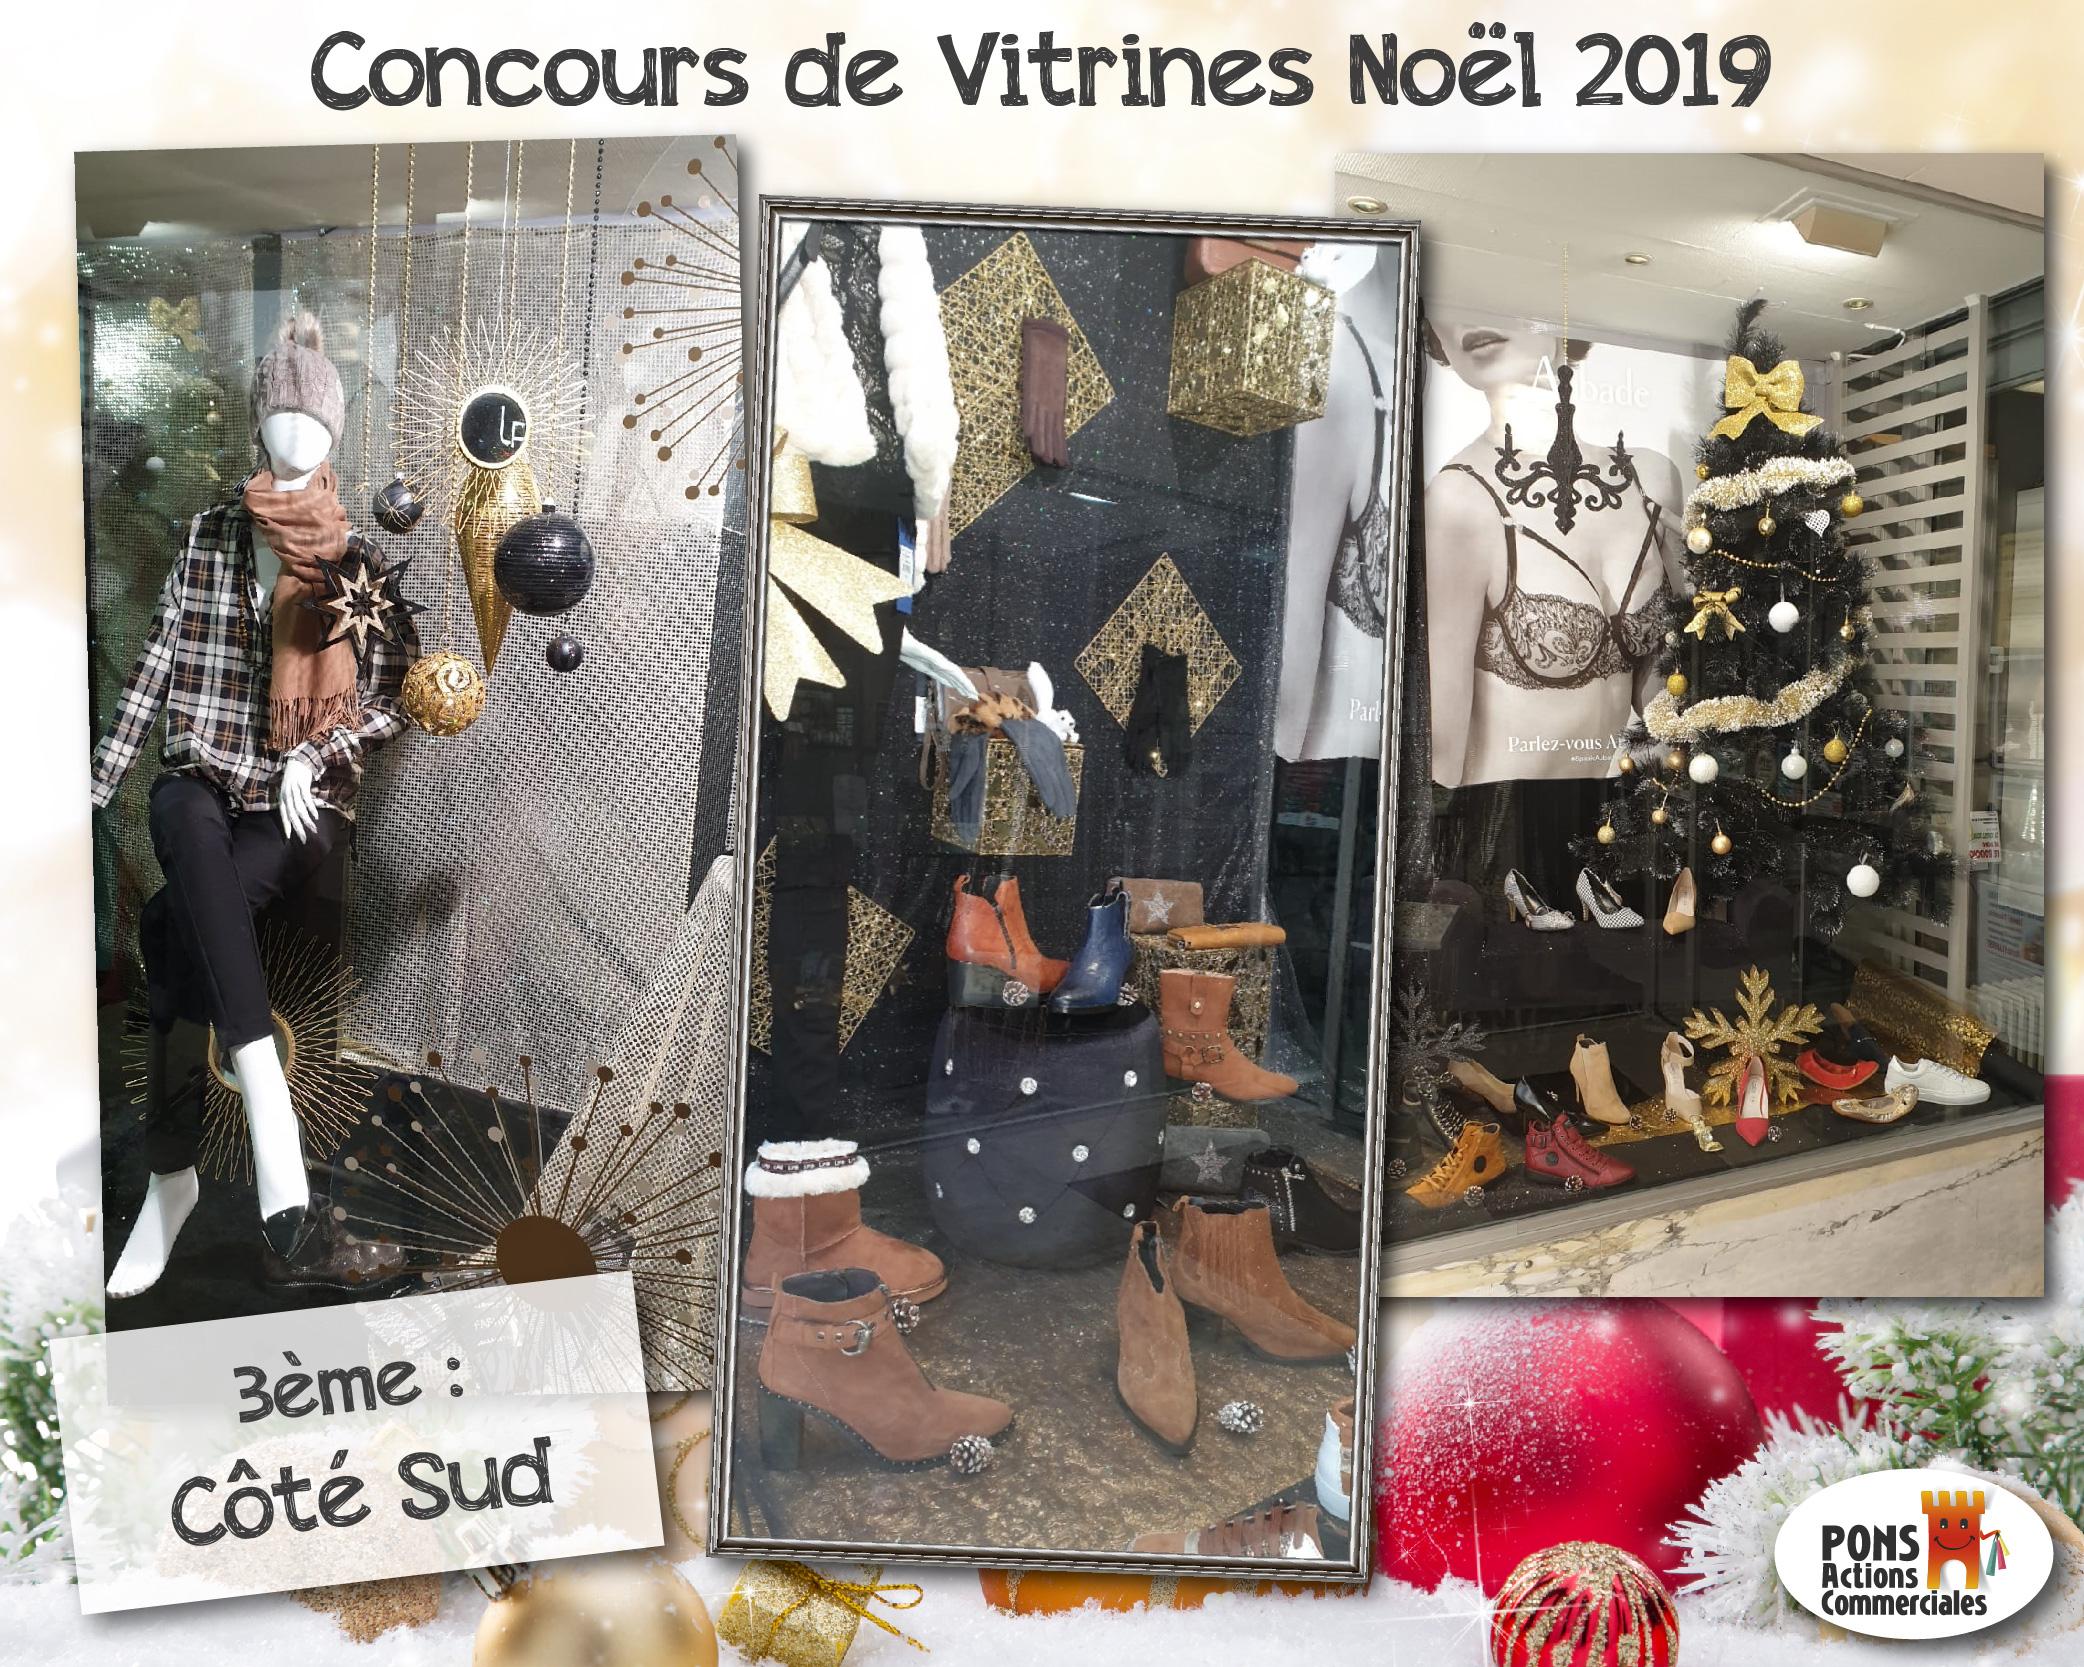 Pons Actions Commerciales - Vitrines2019-Gagnants - Coté Sud